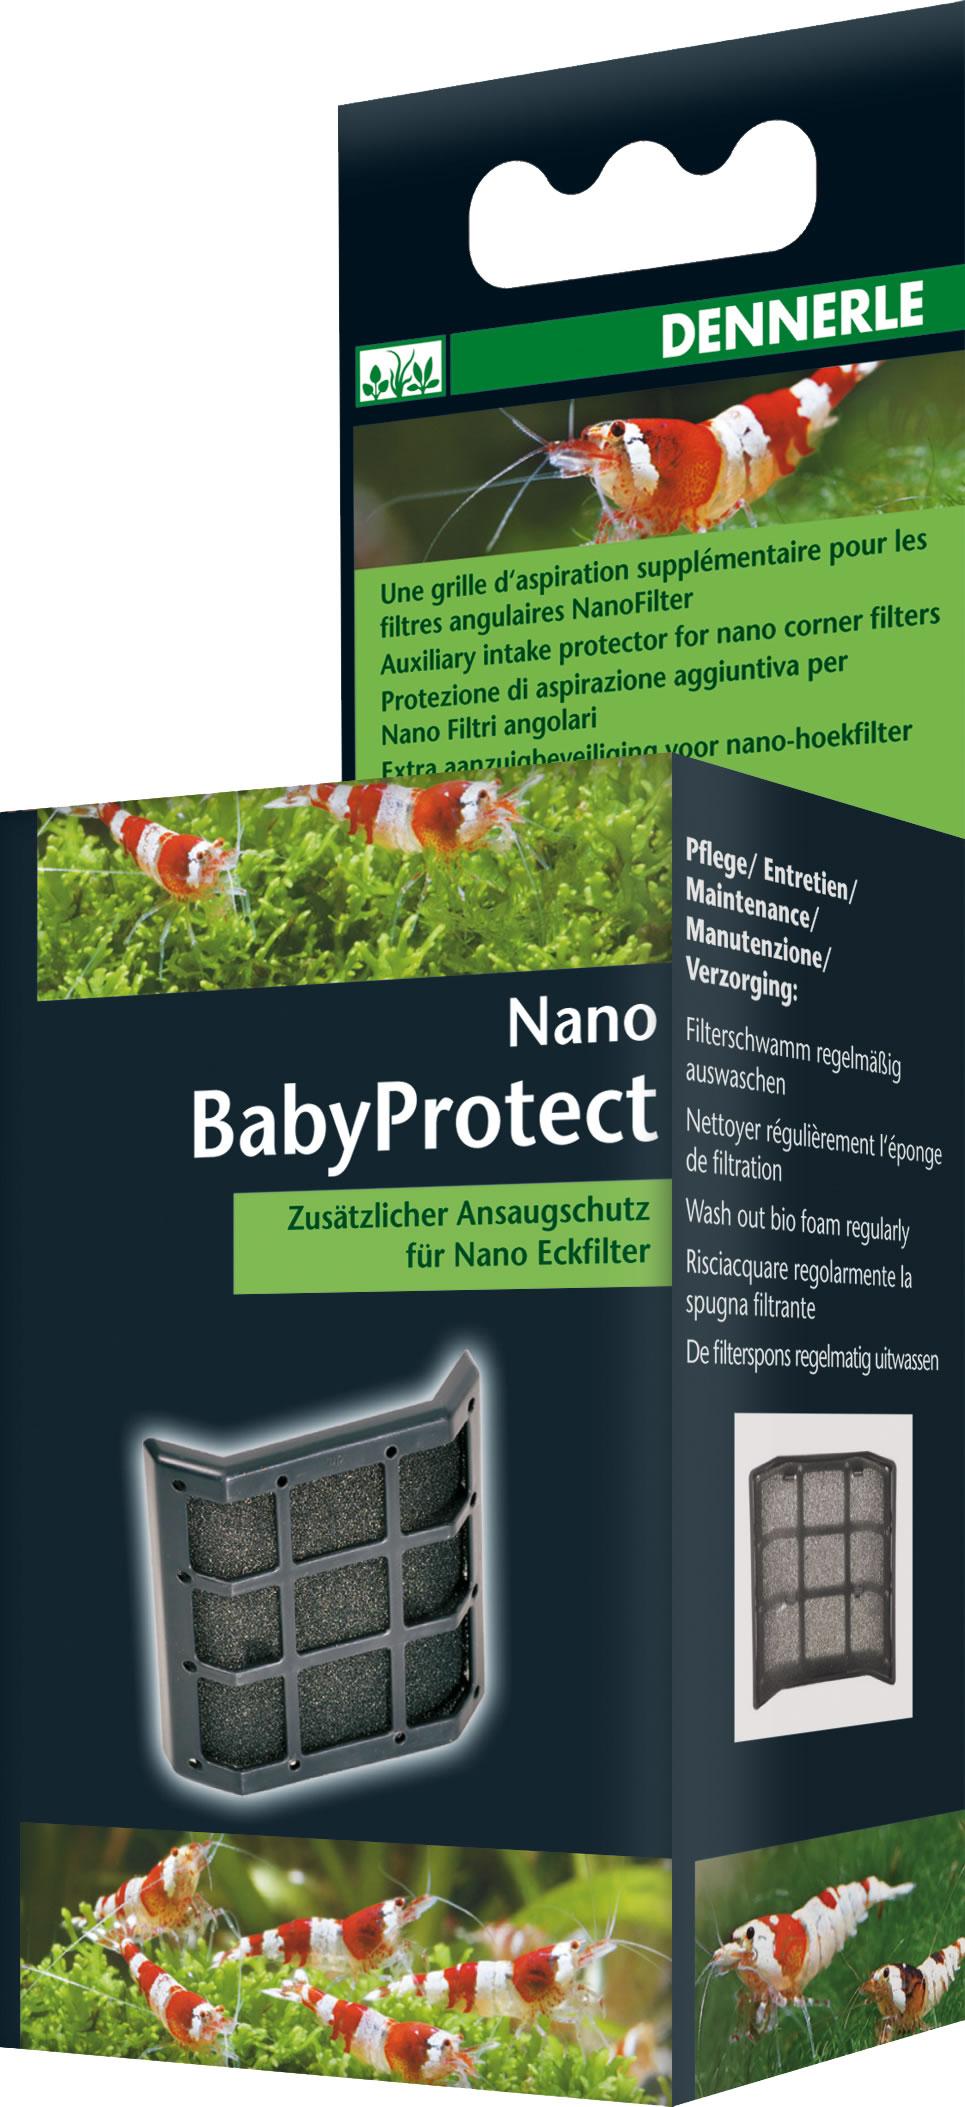 Dennerle Nano BabyProtect Schutzgitter f�r Dennerle Nano Eckfilter